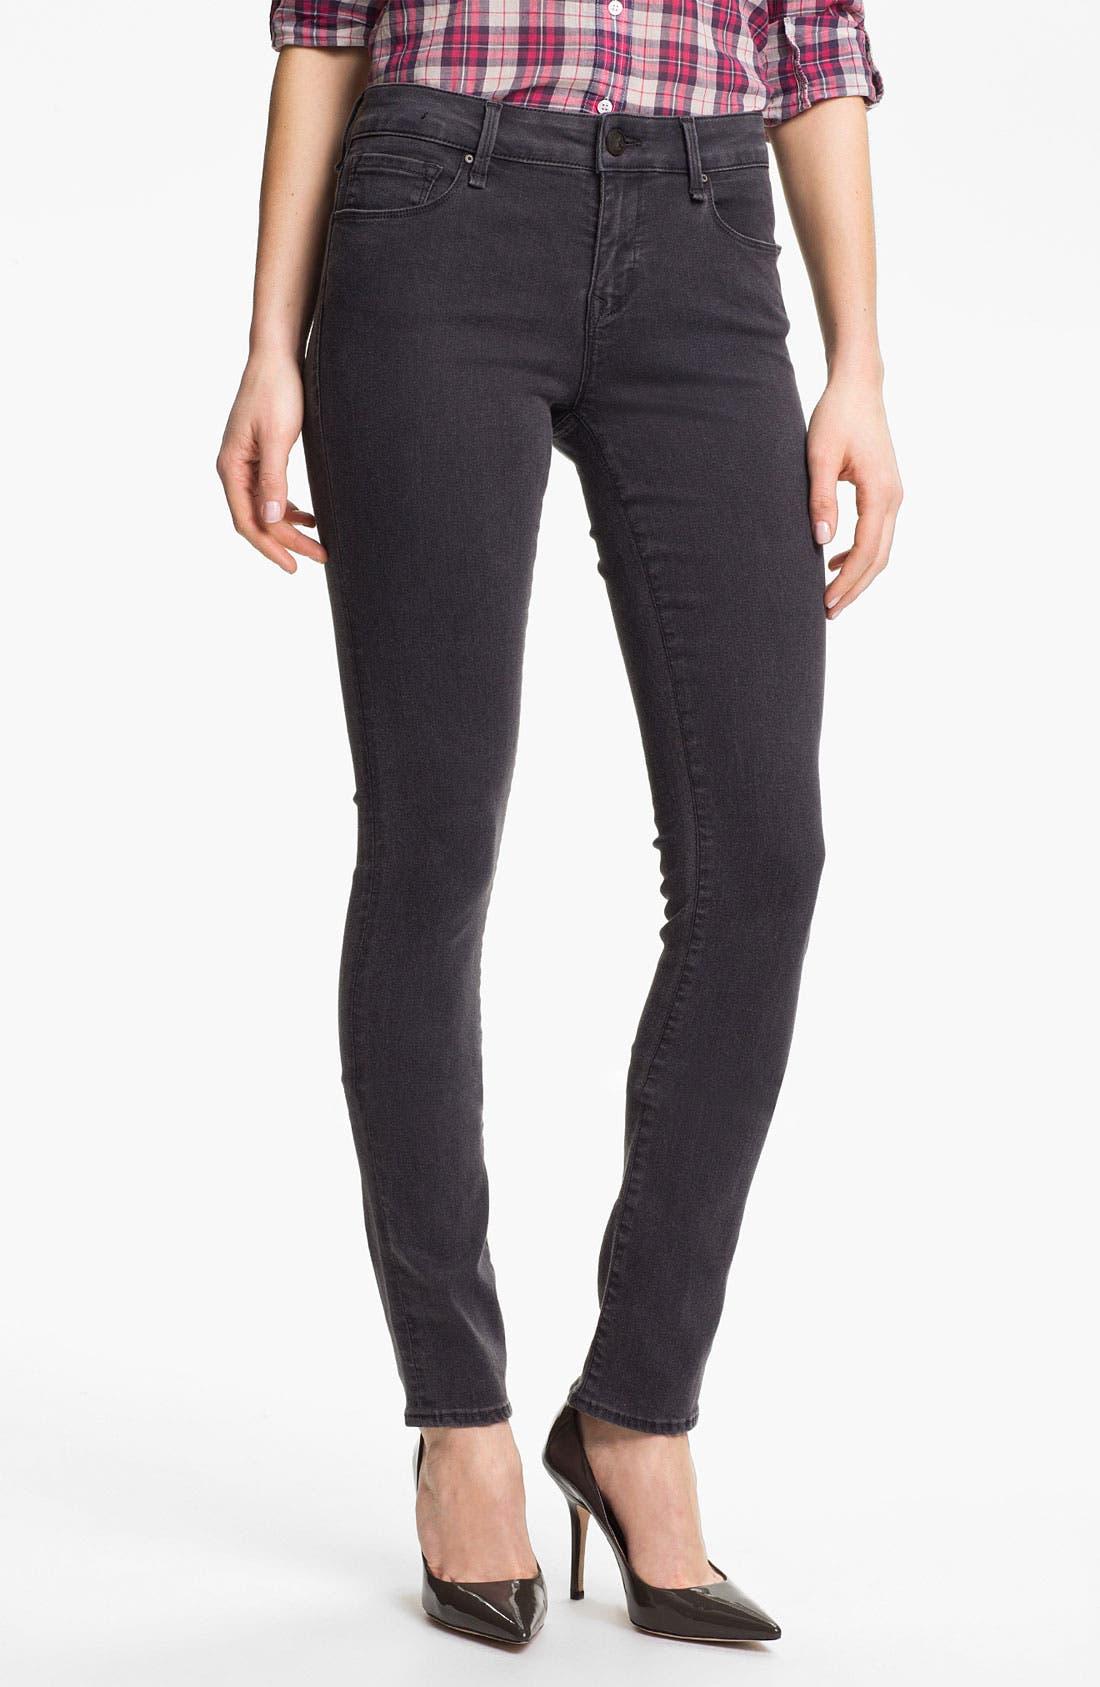 Main Image - Mavi Jeans 'Serena' Skinny Jeans (Grey Shanti)